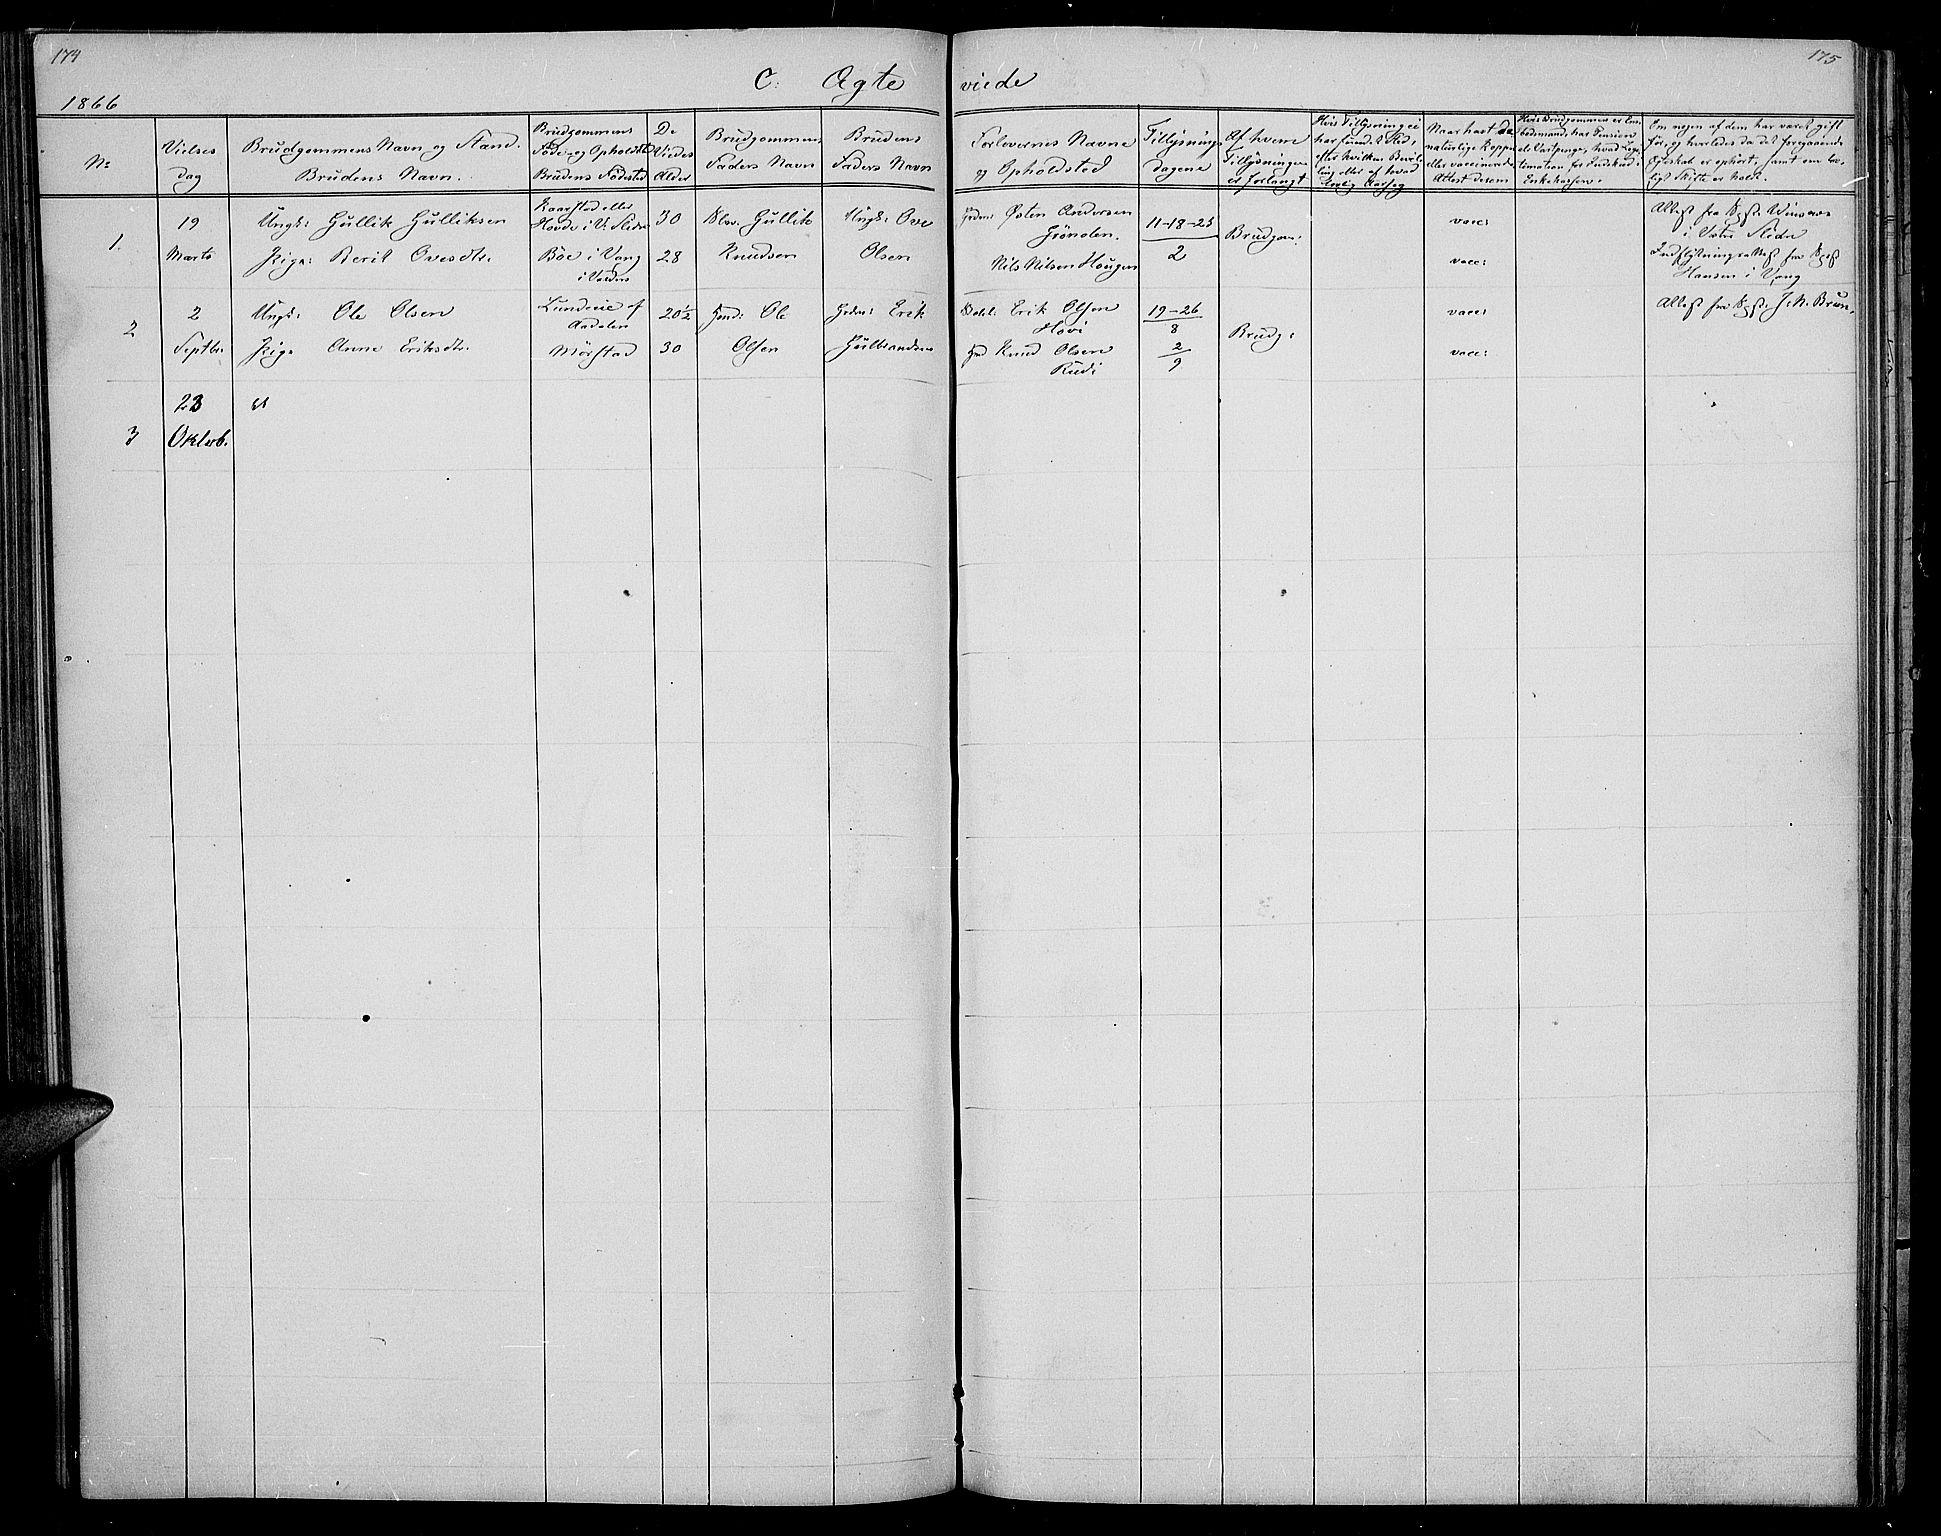 SAH, Øystre Slidre prestekontor, Klokkerbok nr. 1, 1866-1886, s. 177-178